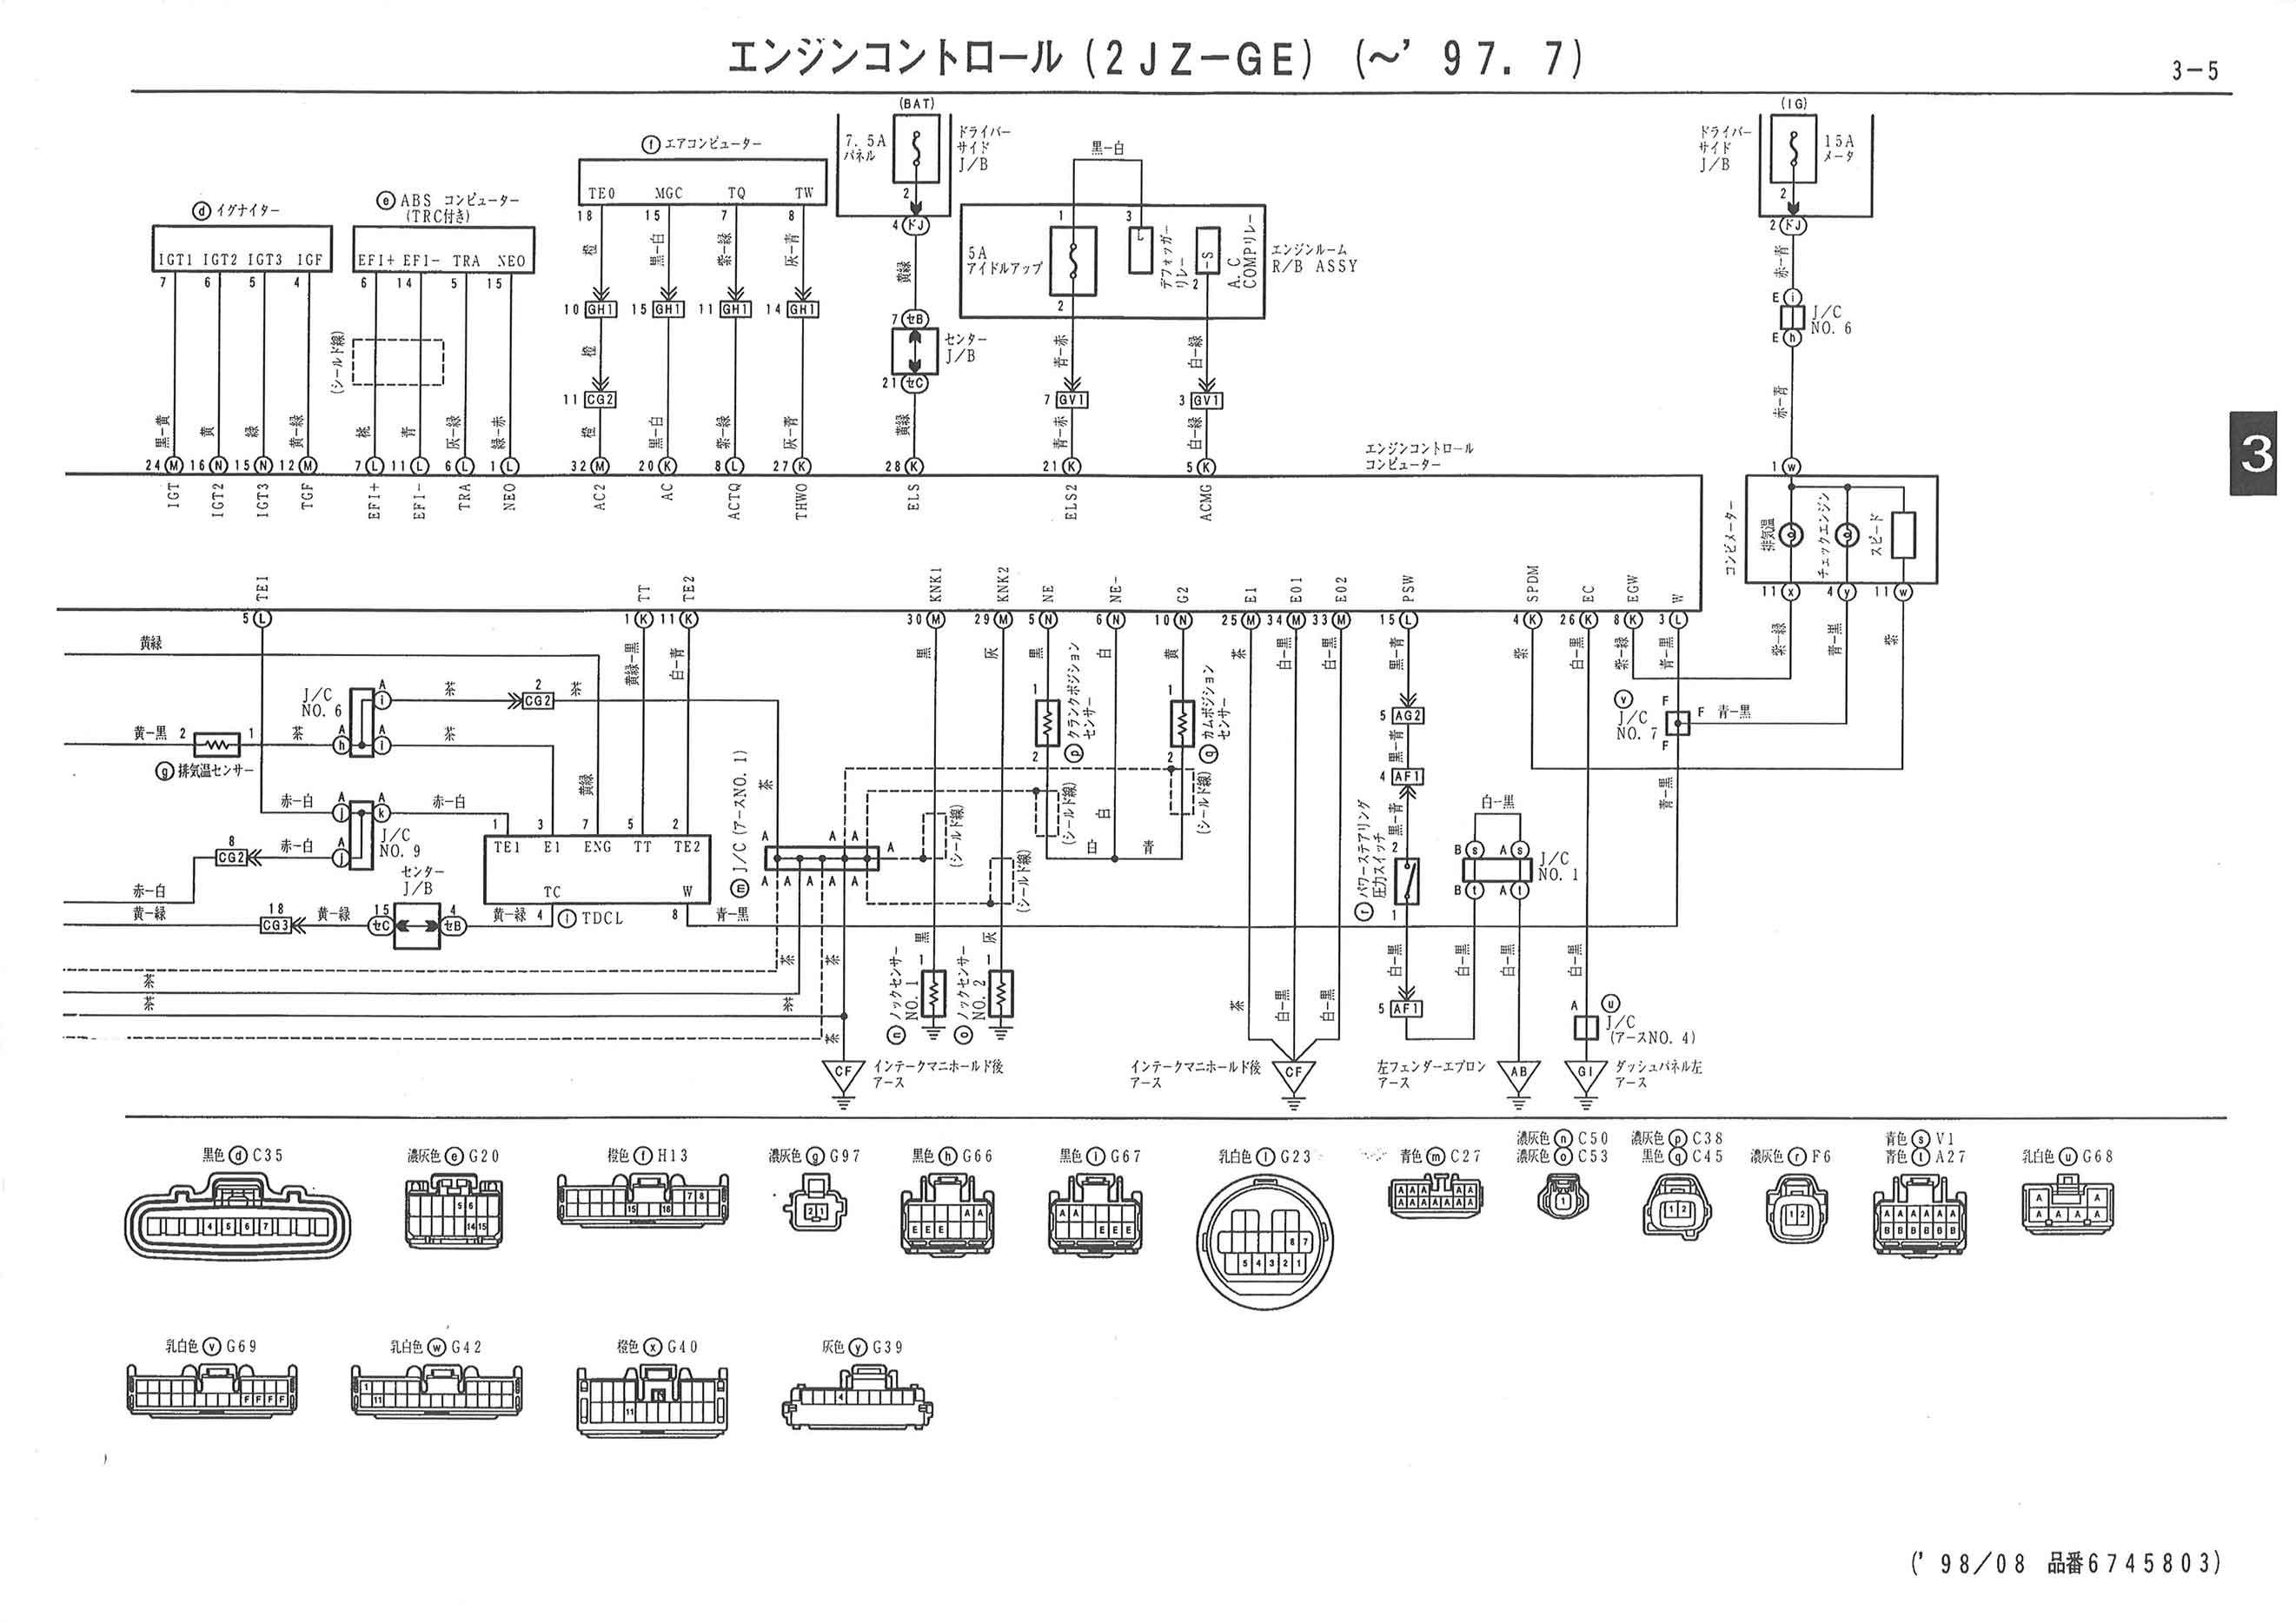 [SCHEMATICS_44OR]  YY_8916] Diagram Ge Sensor Wiring Diagram 2Jz Vvt I Engine Wiring Diagram  Ge Free Diagram | Vvt I Engine Wiring Diagram |  | Dome Genion Ling Opein Pendu Pneu Kicep Mohammedshrine Librar Wiring 101